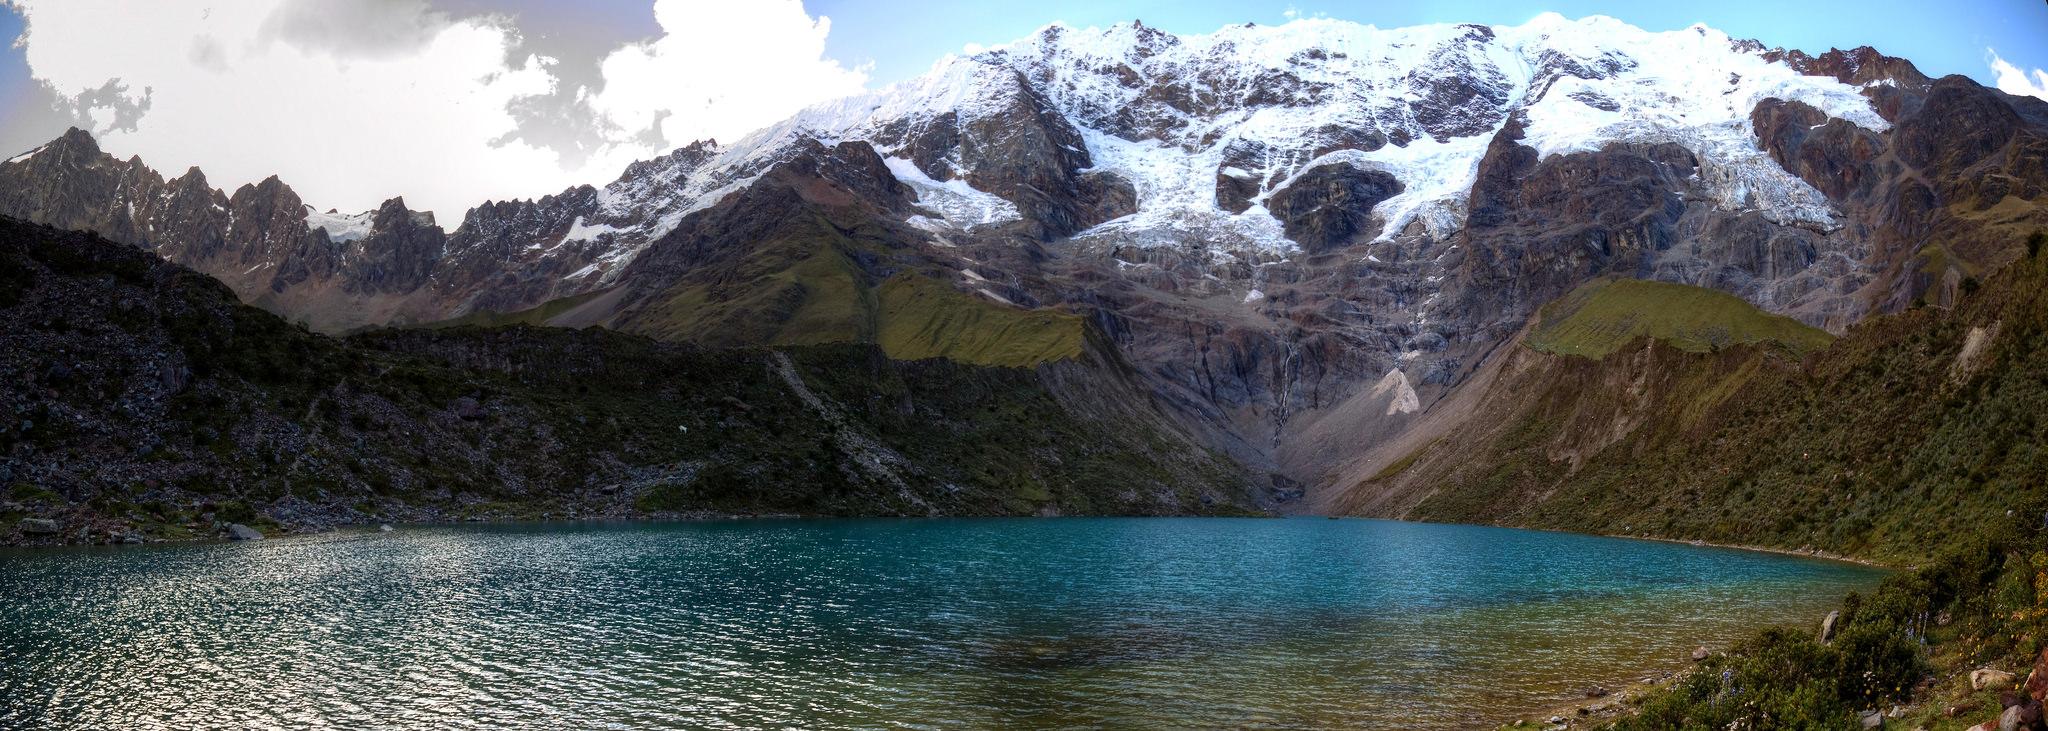 Humanity Lake - Salkantay Trekking